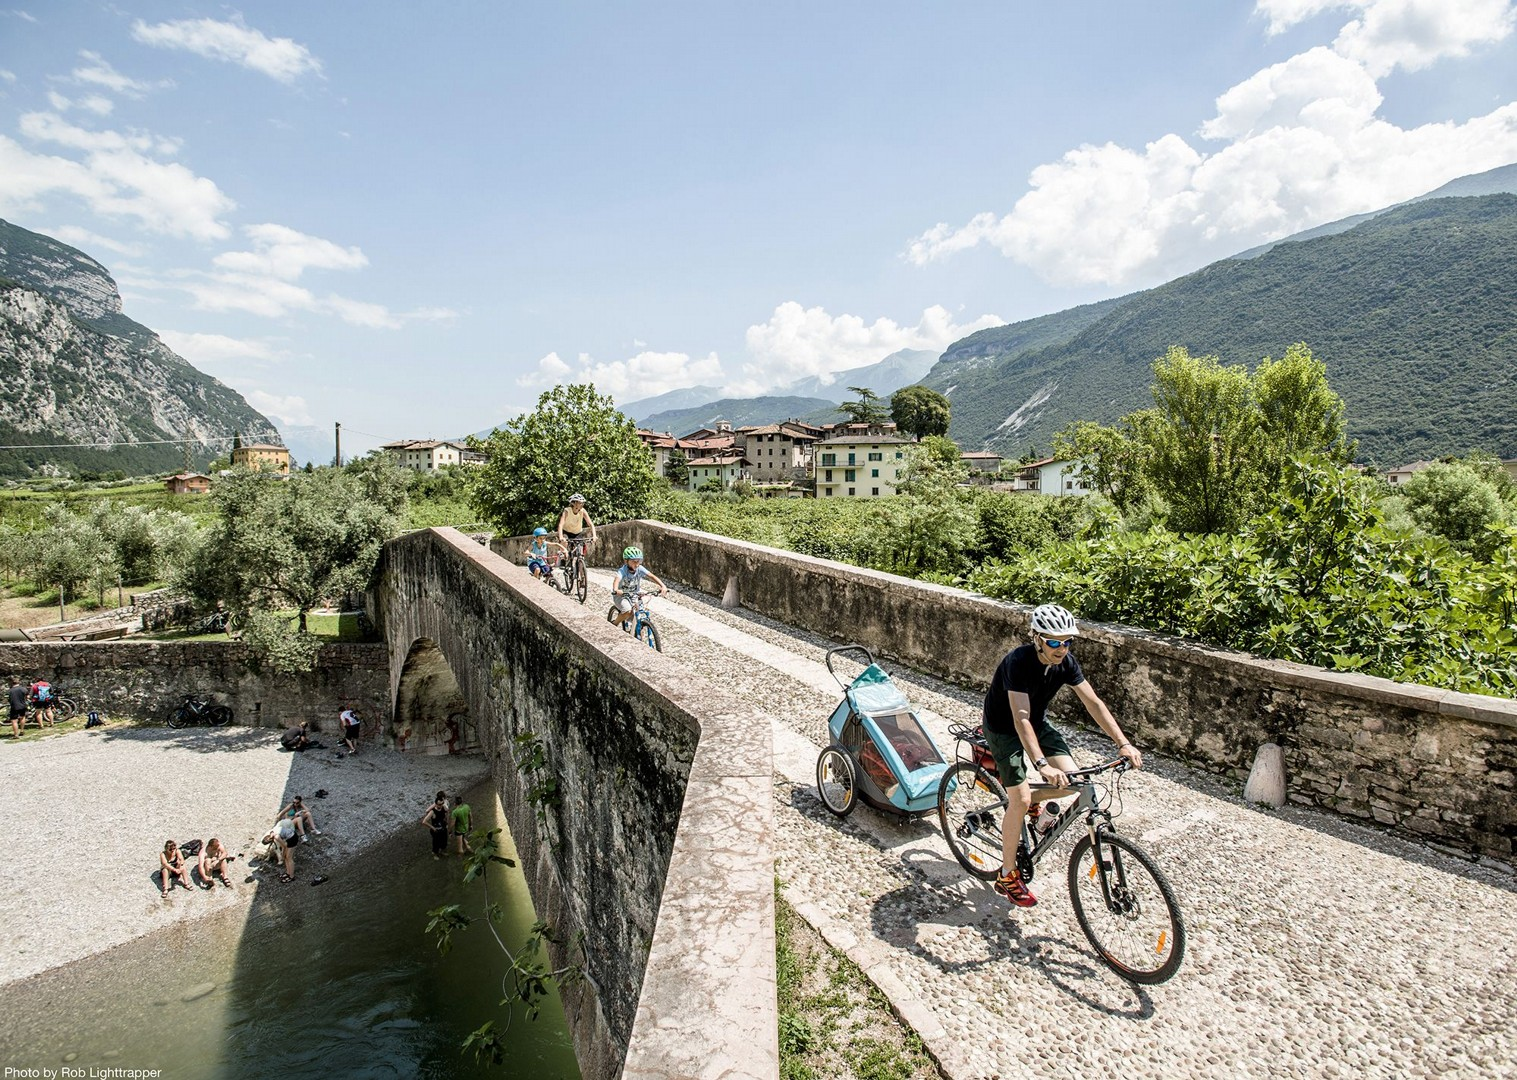 la-via-claudia-self-guided-family-cycling-holiday-in-italy.jpg - Italy - La Via Claudia - Self-Guided Family Cycling Holiday - Family Cycling